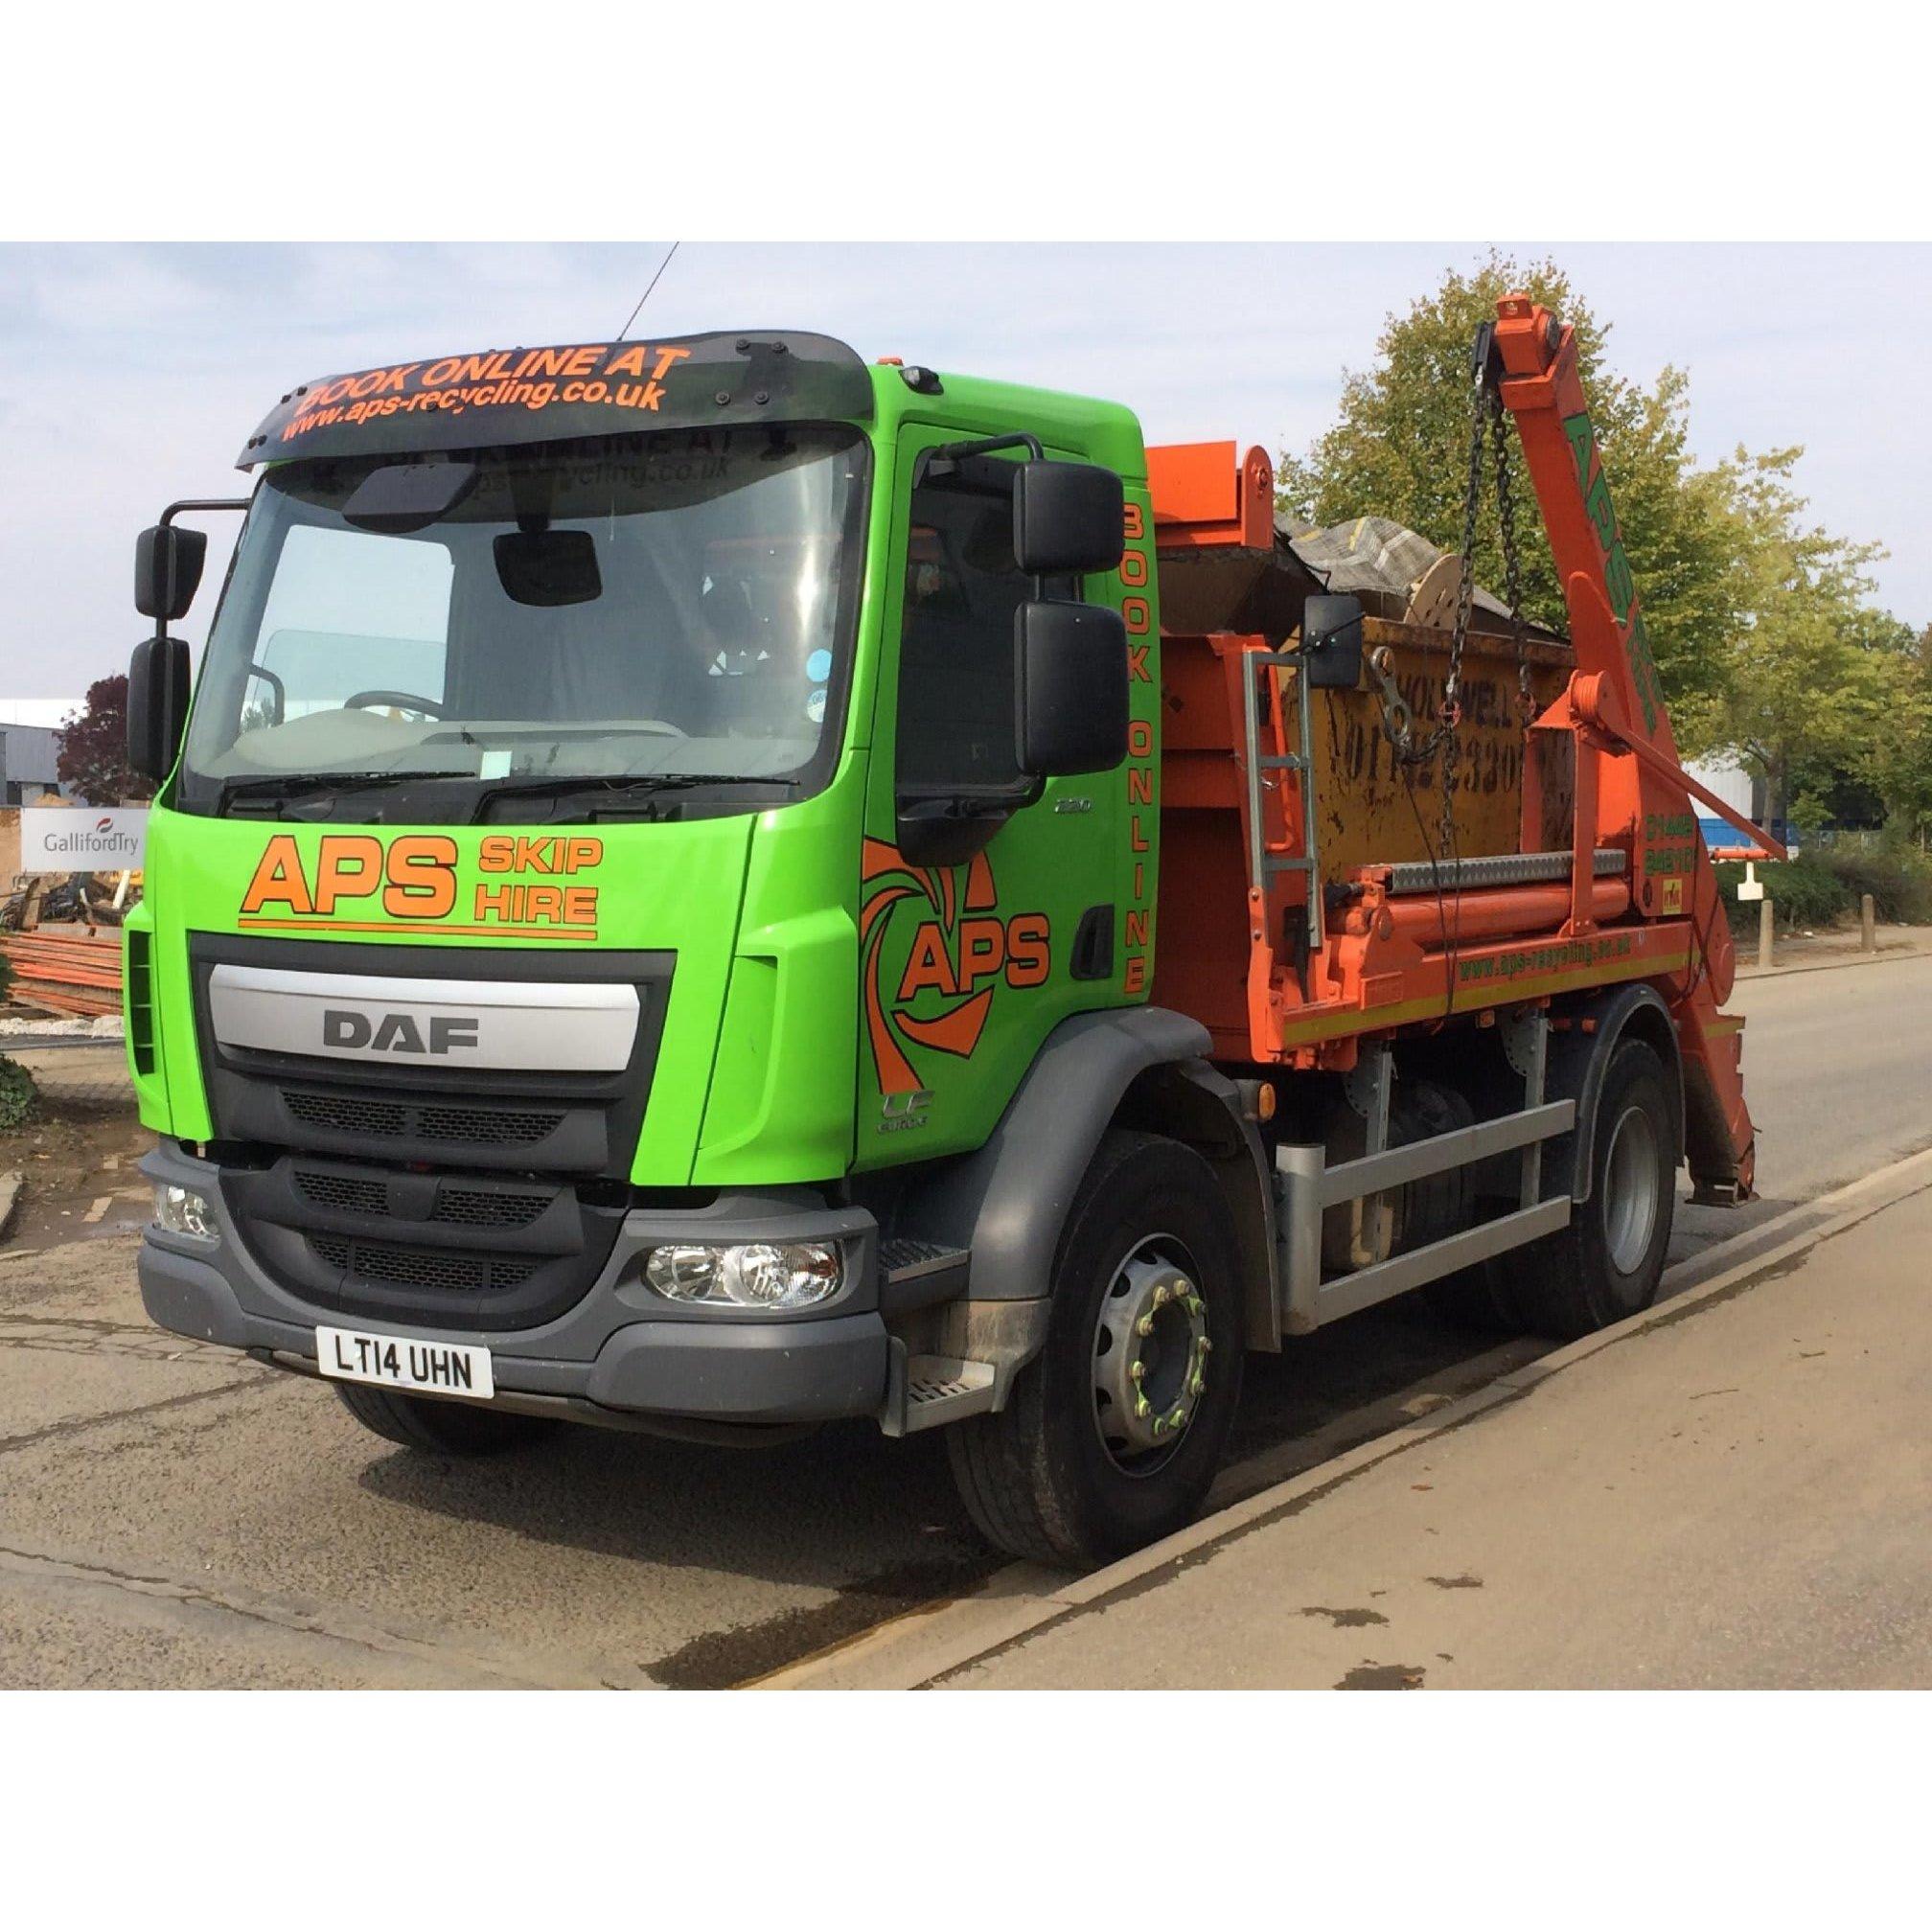 APS Recycling & Skip Hire - Hemel Hempstead, Hertfordshire HP2 7DX - 01442 242101 | ShowMeLocal.com